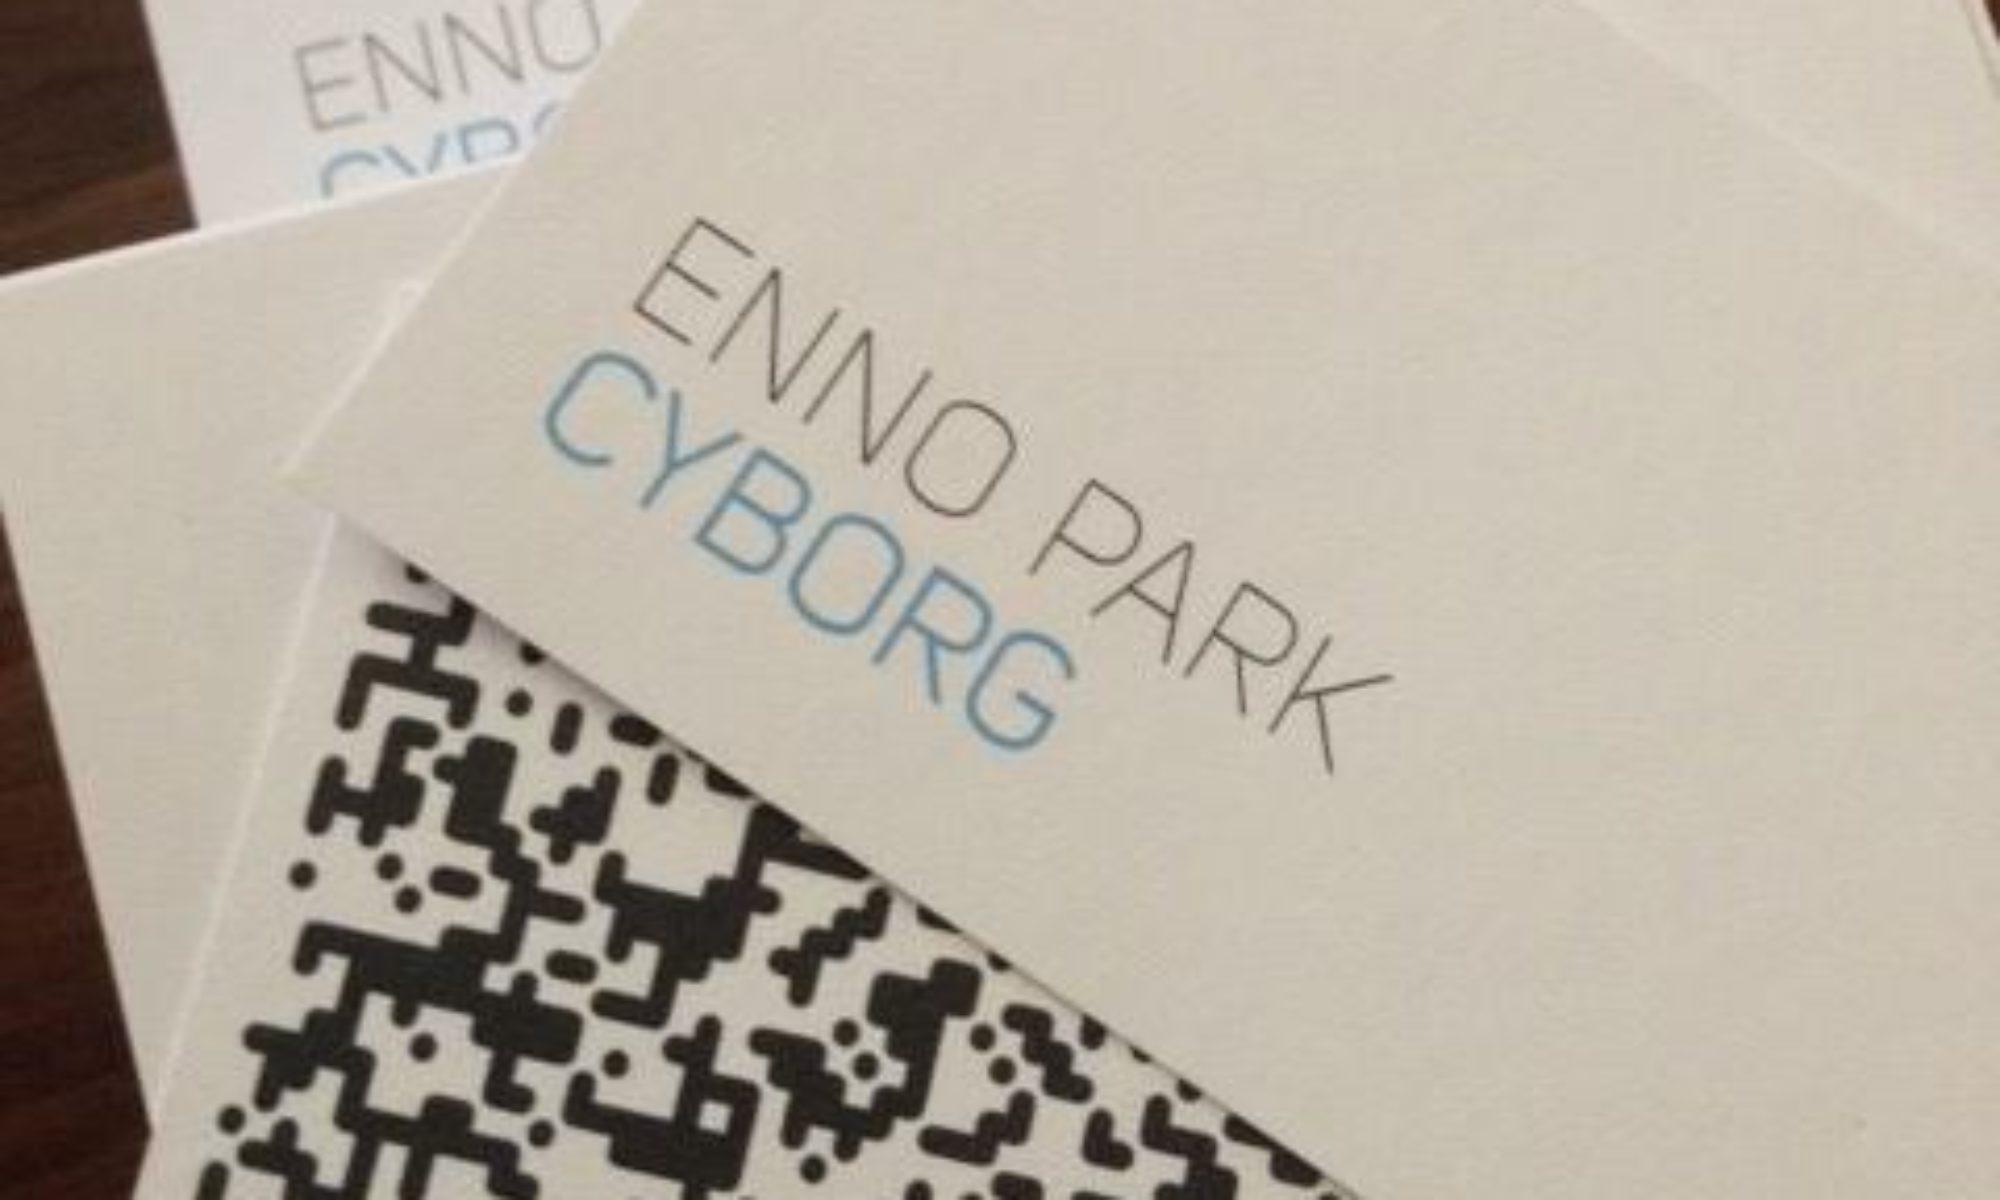 Enno Park